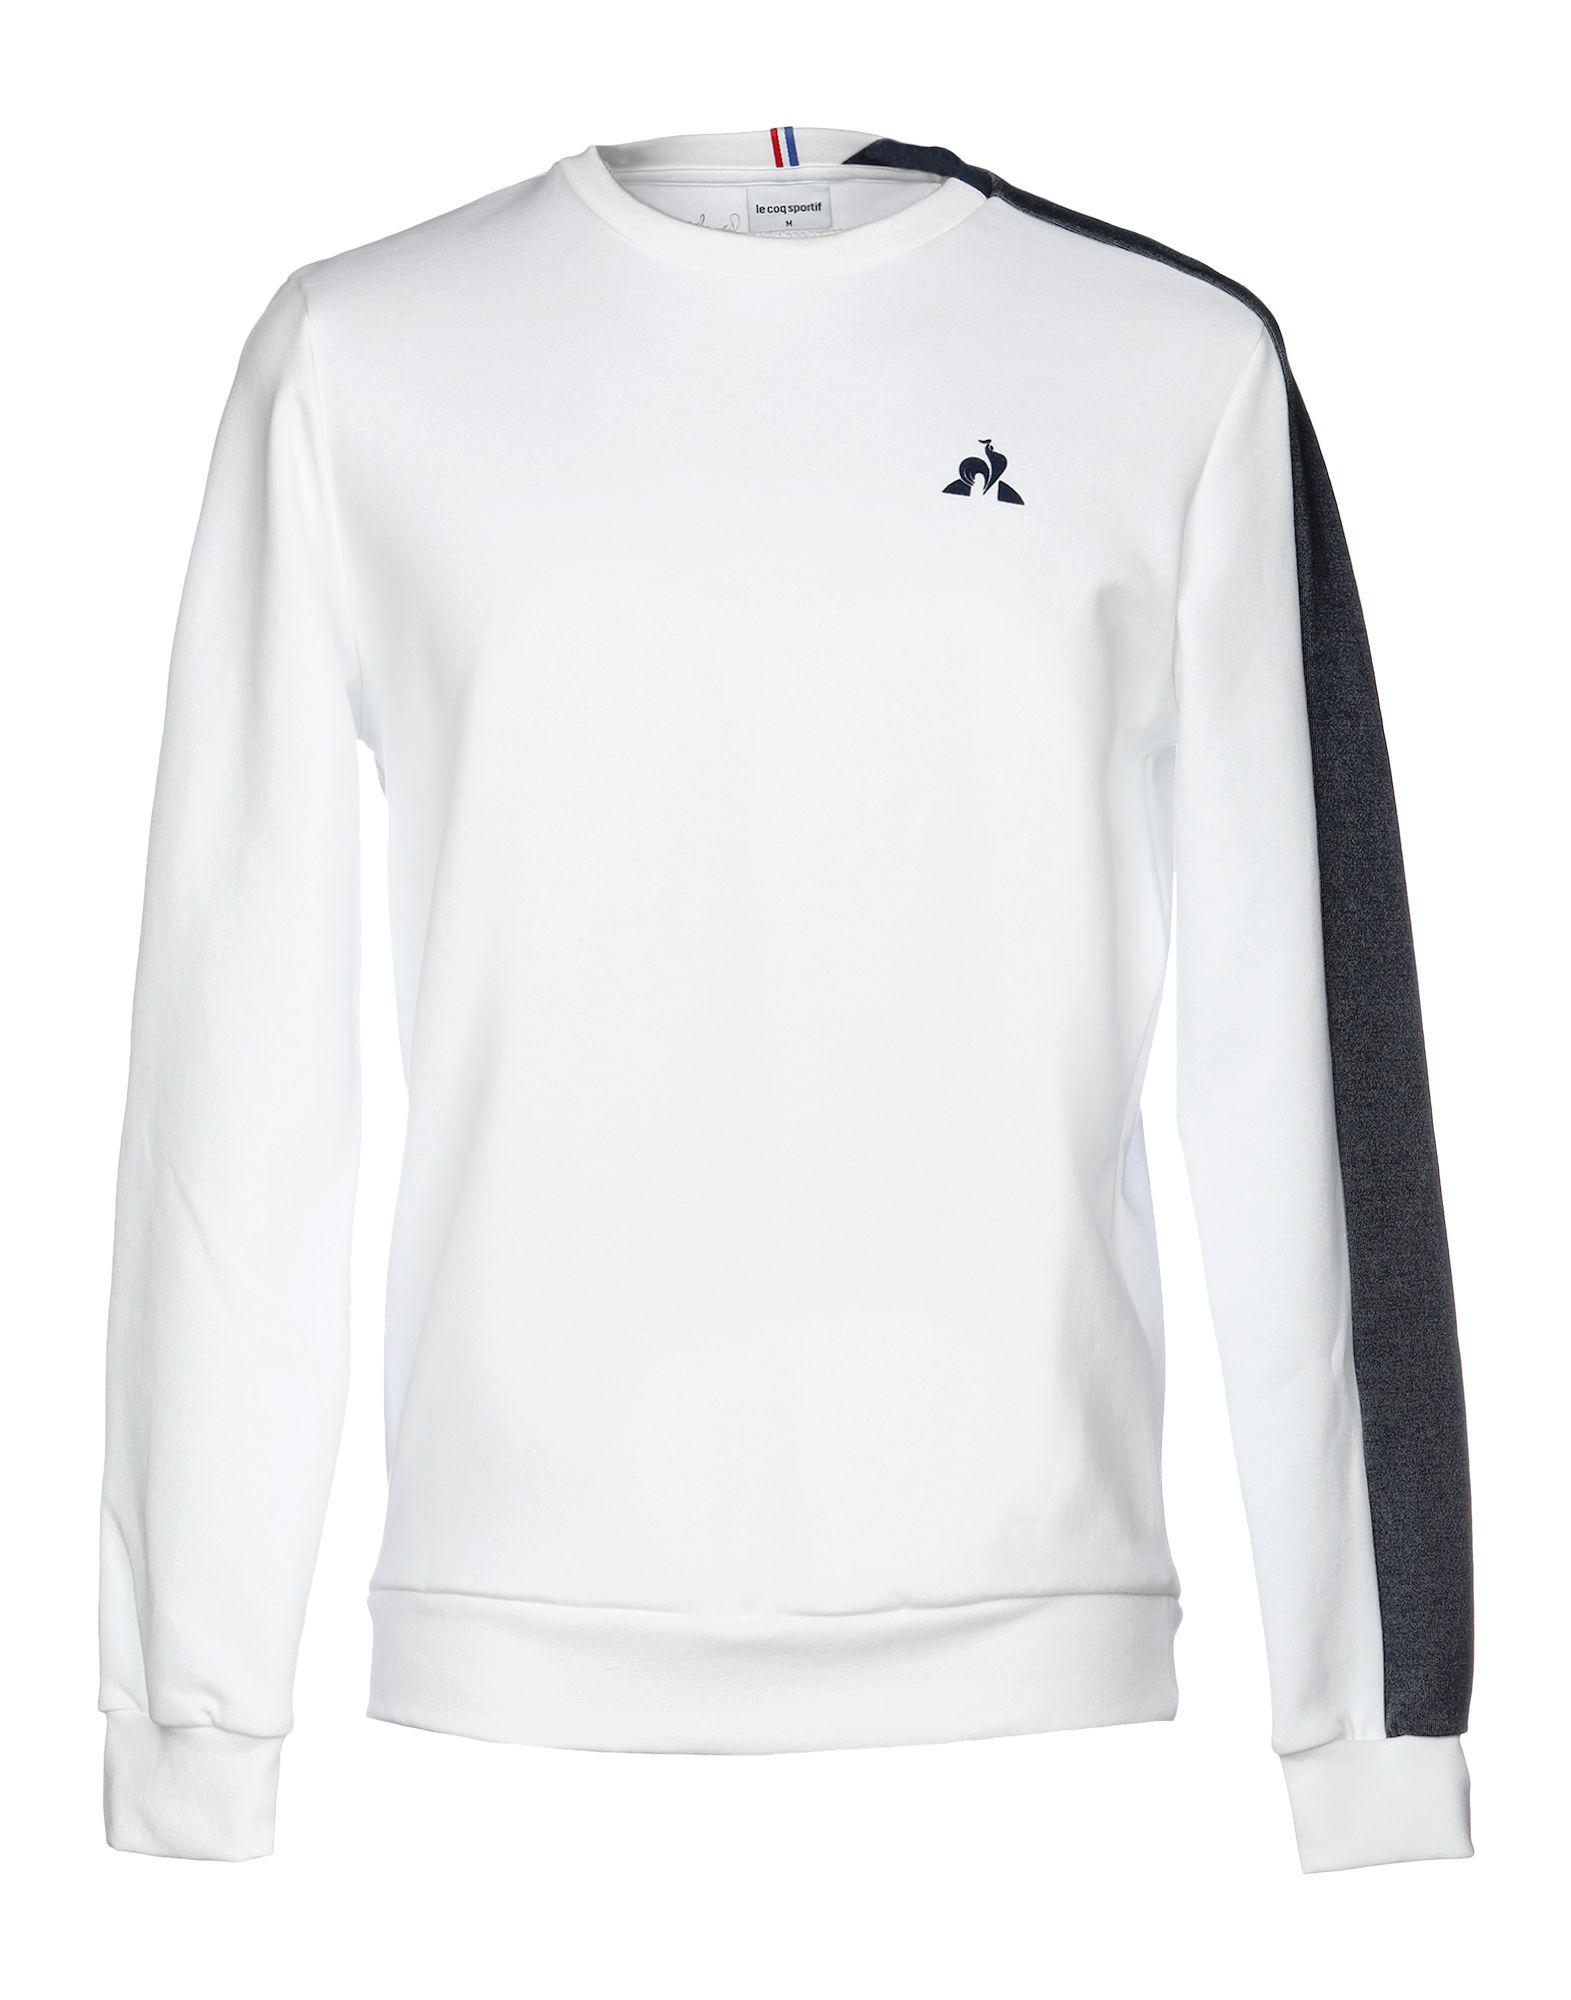 a35f0507176f Le Coq Sportif - White Sweatshirt for Men - Lyst. View fullscreen